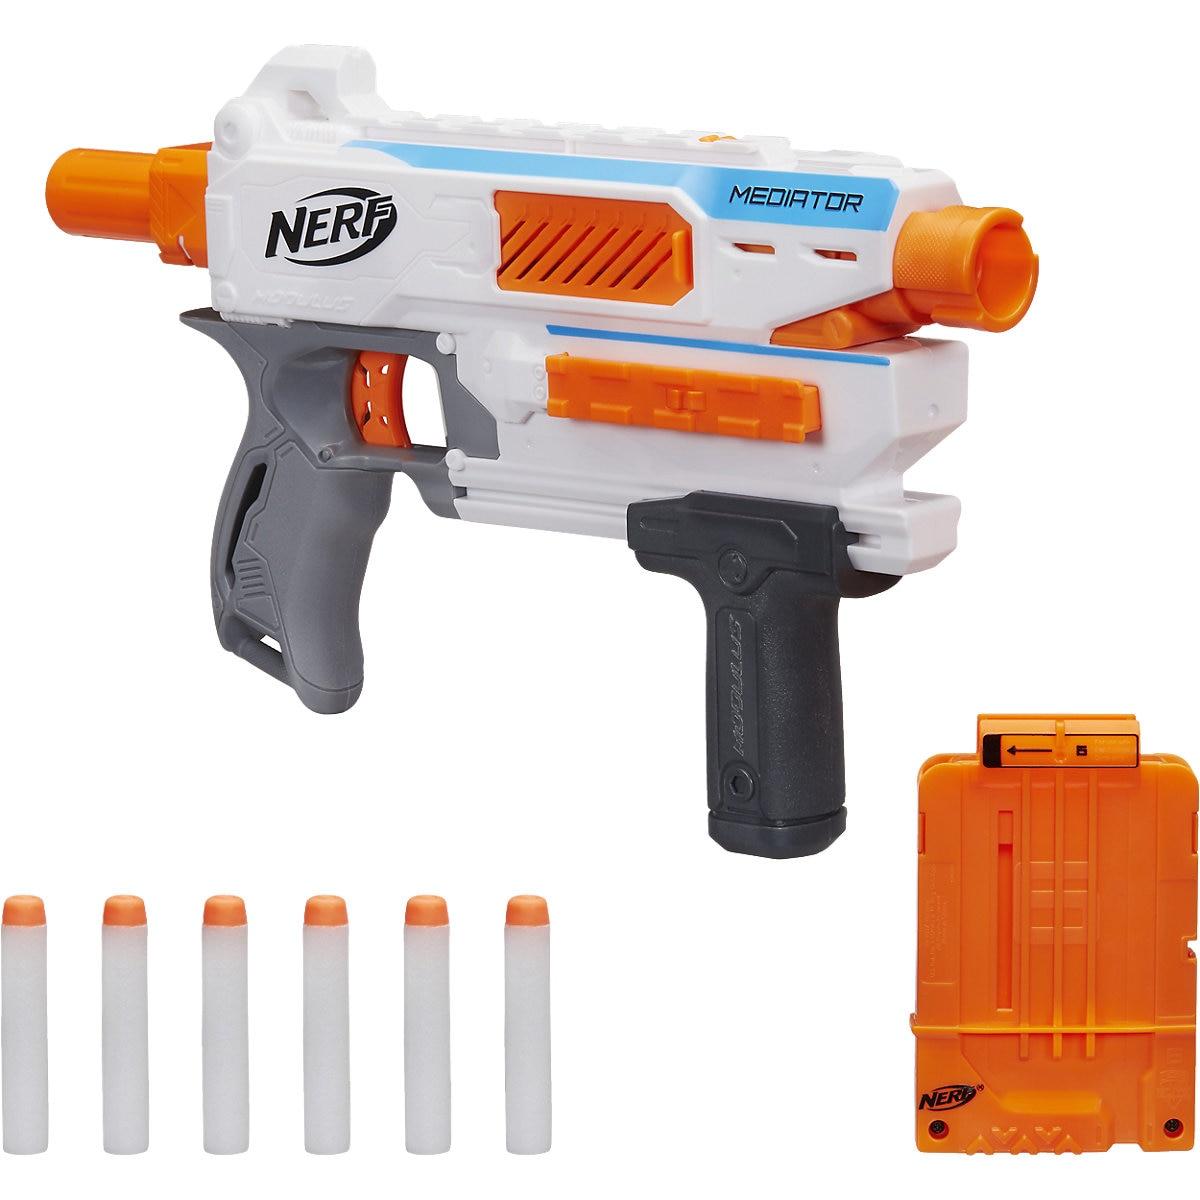 NERF Toy Guns 7196314 gun weapon toys games pneumatic blaster boy orbiz revolver Outdoor Fun Sports MTpromo